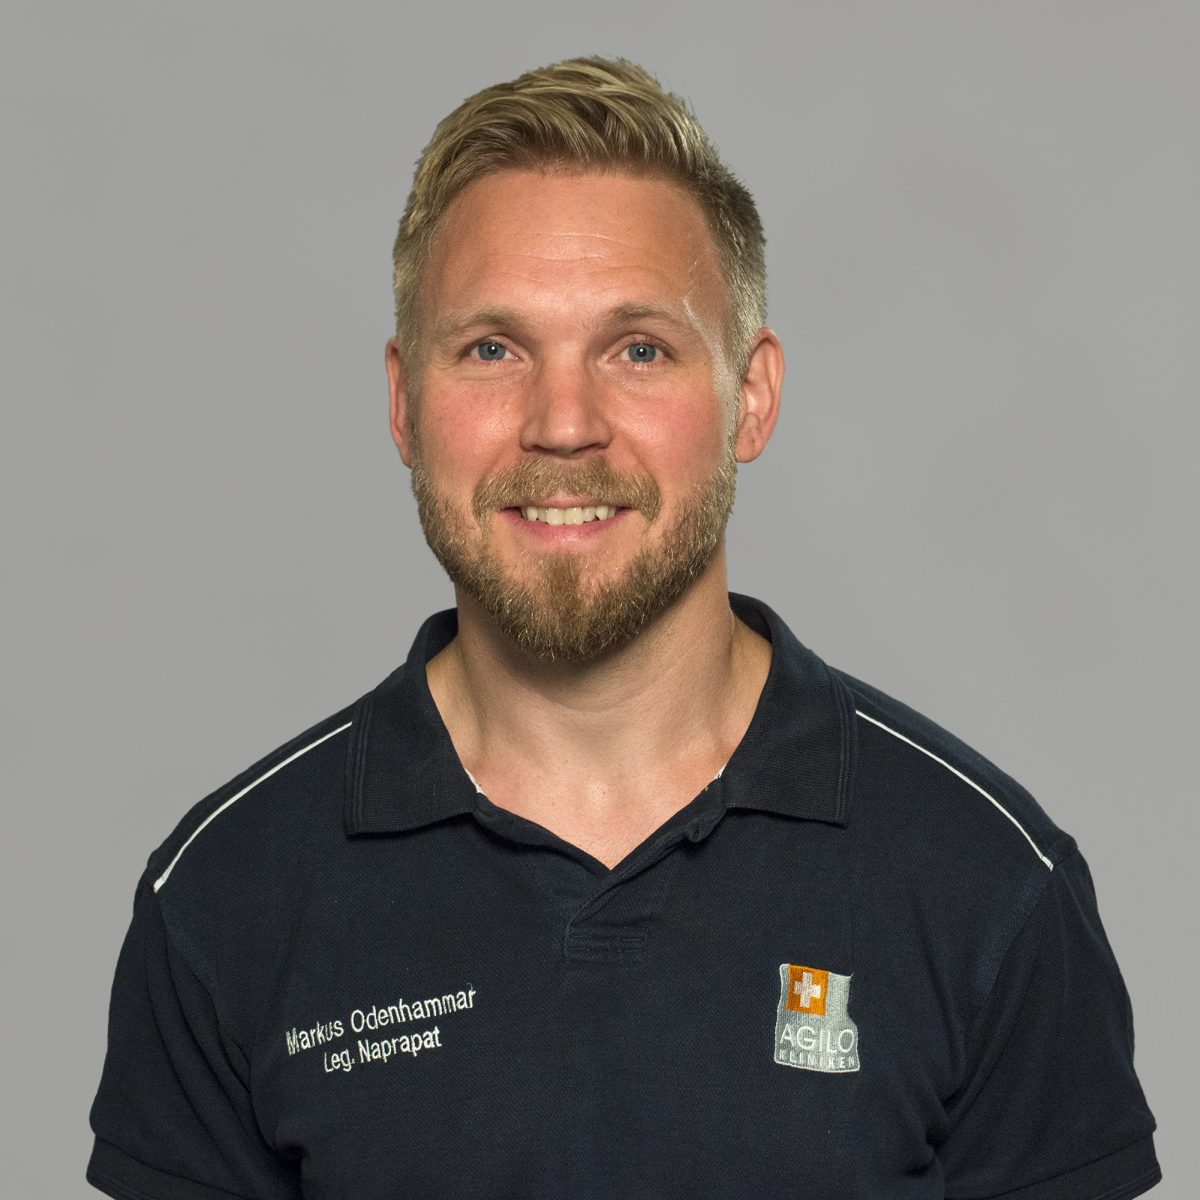 Markus Odenhammar